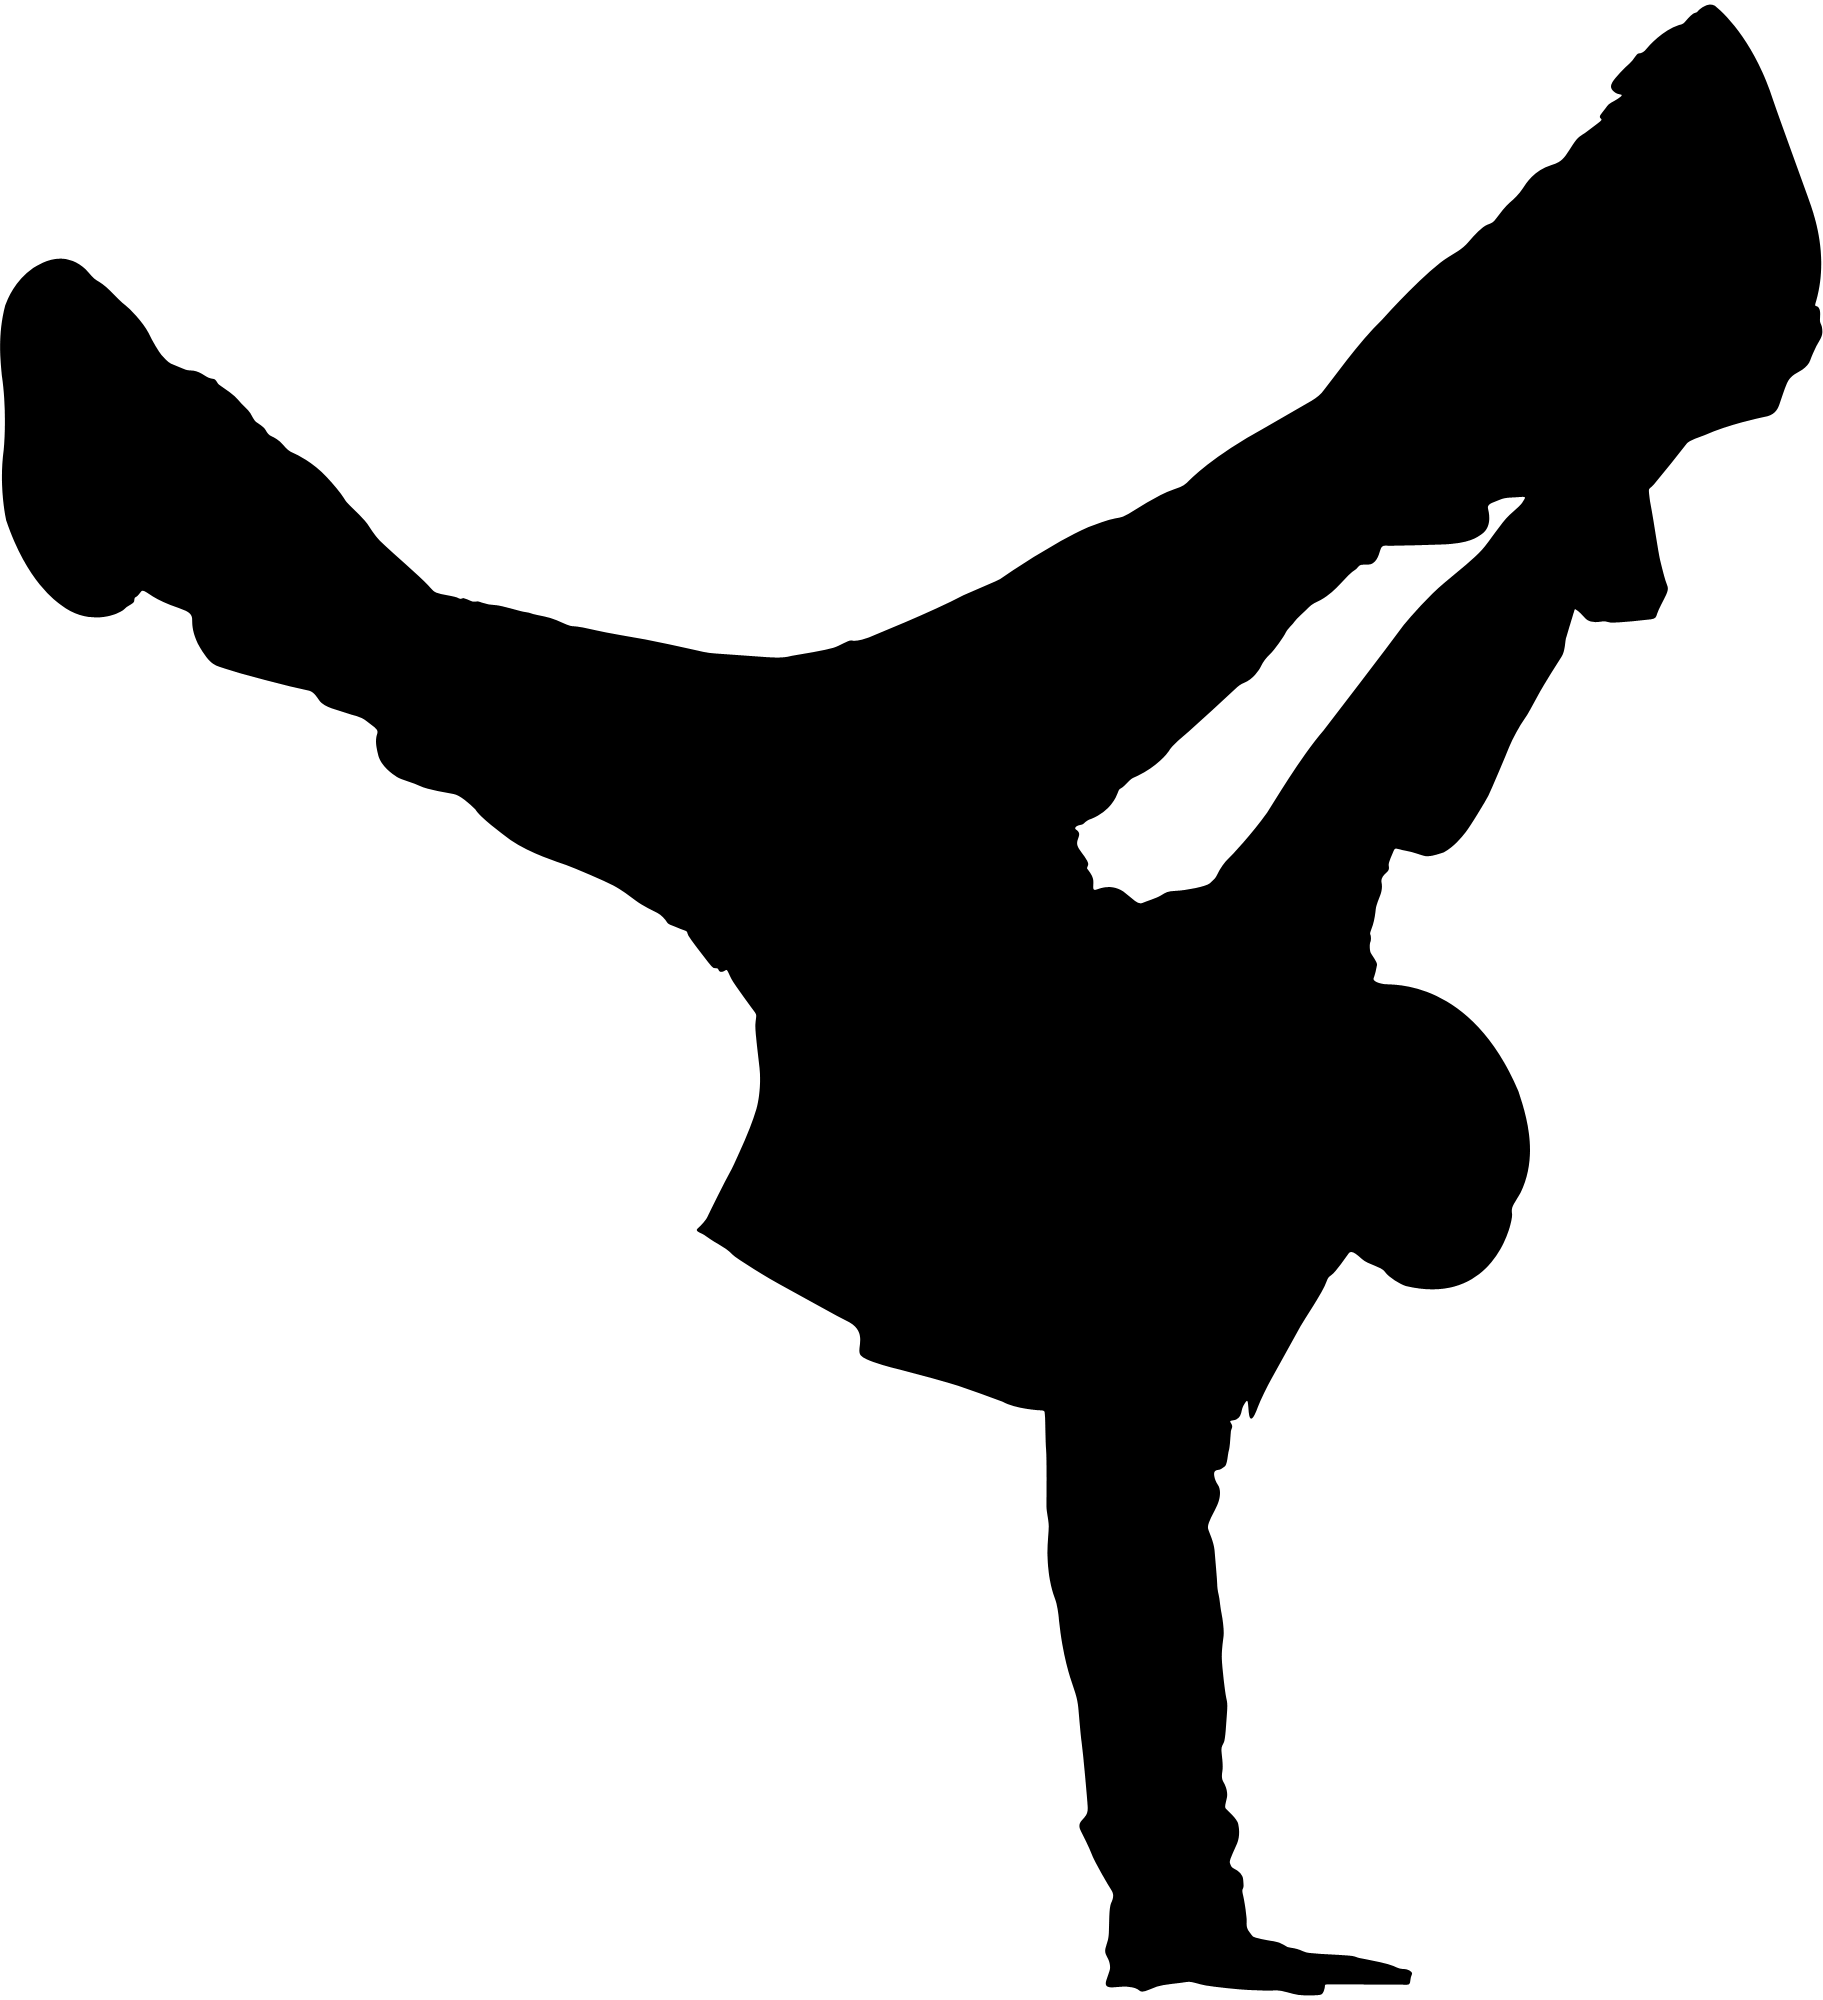 gymnastics handstand silhouette clipart panda free tae kwon do clip art free taekwondo clip art black & white